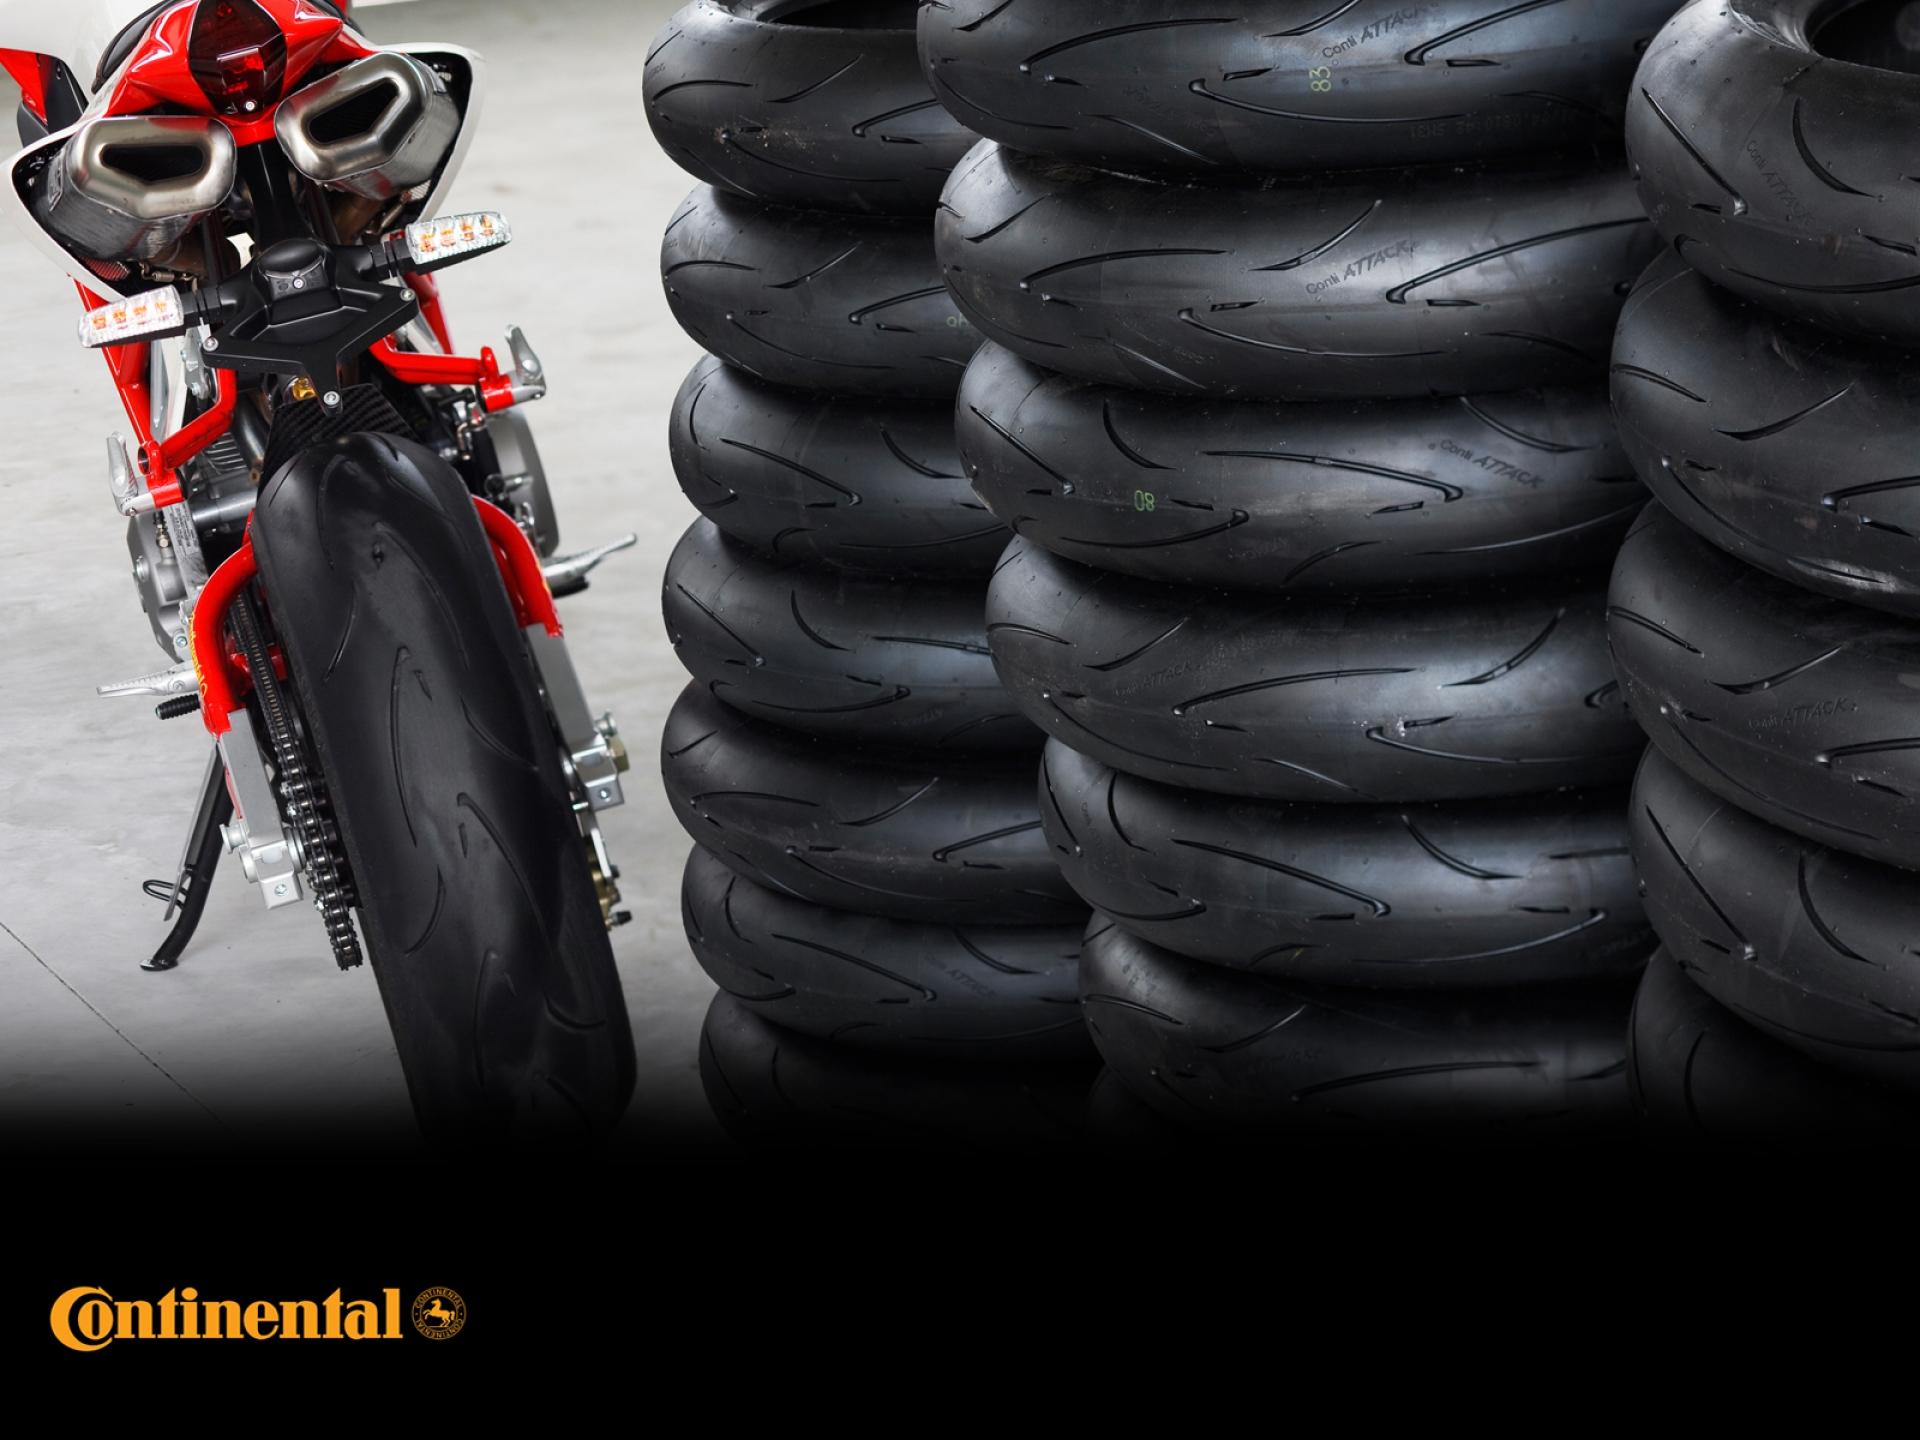 Continental recalls 170,000 tyres